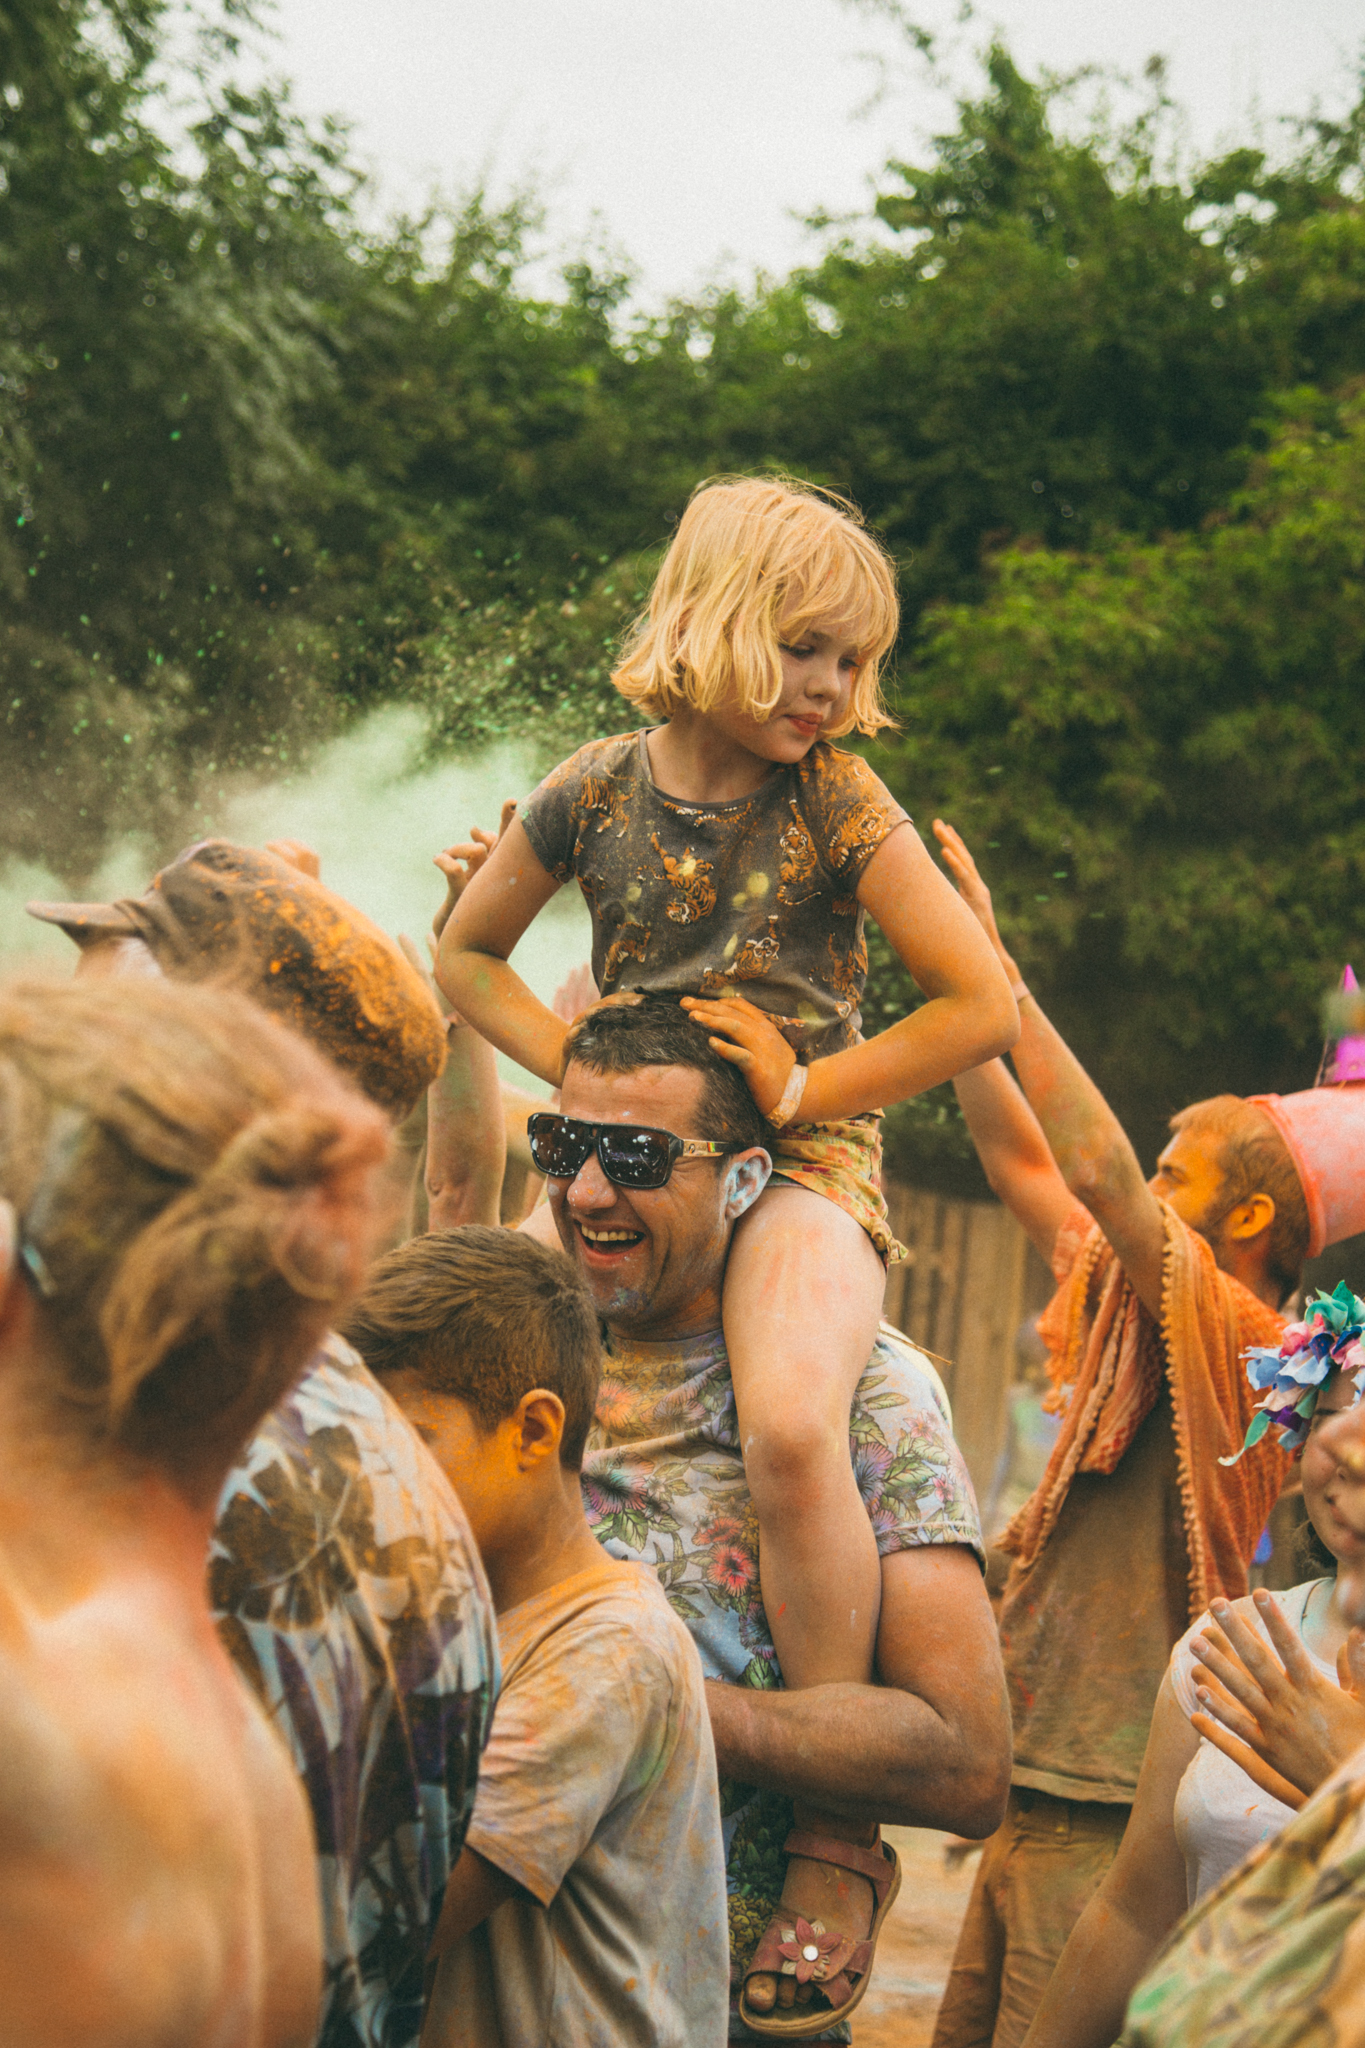 Dusty fun at Nozstock - credit Charlie Rimmer